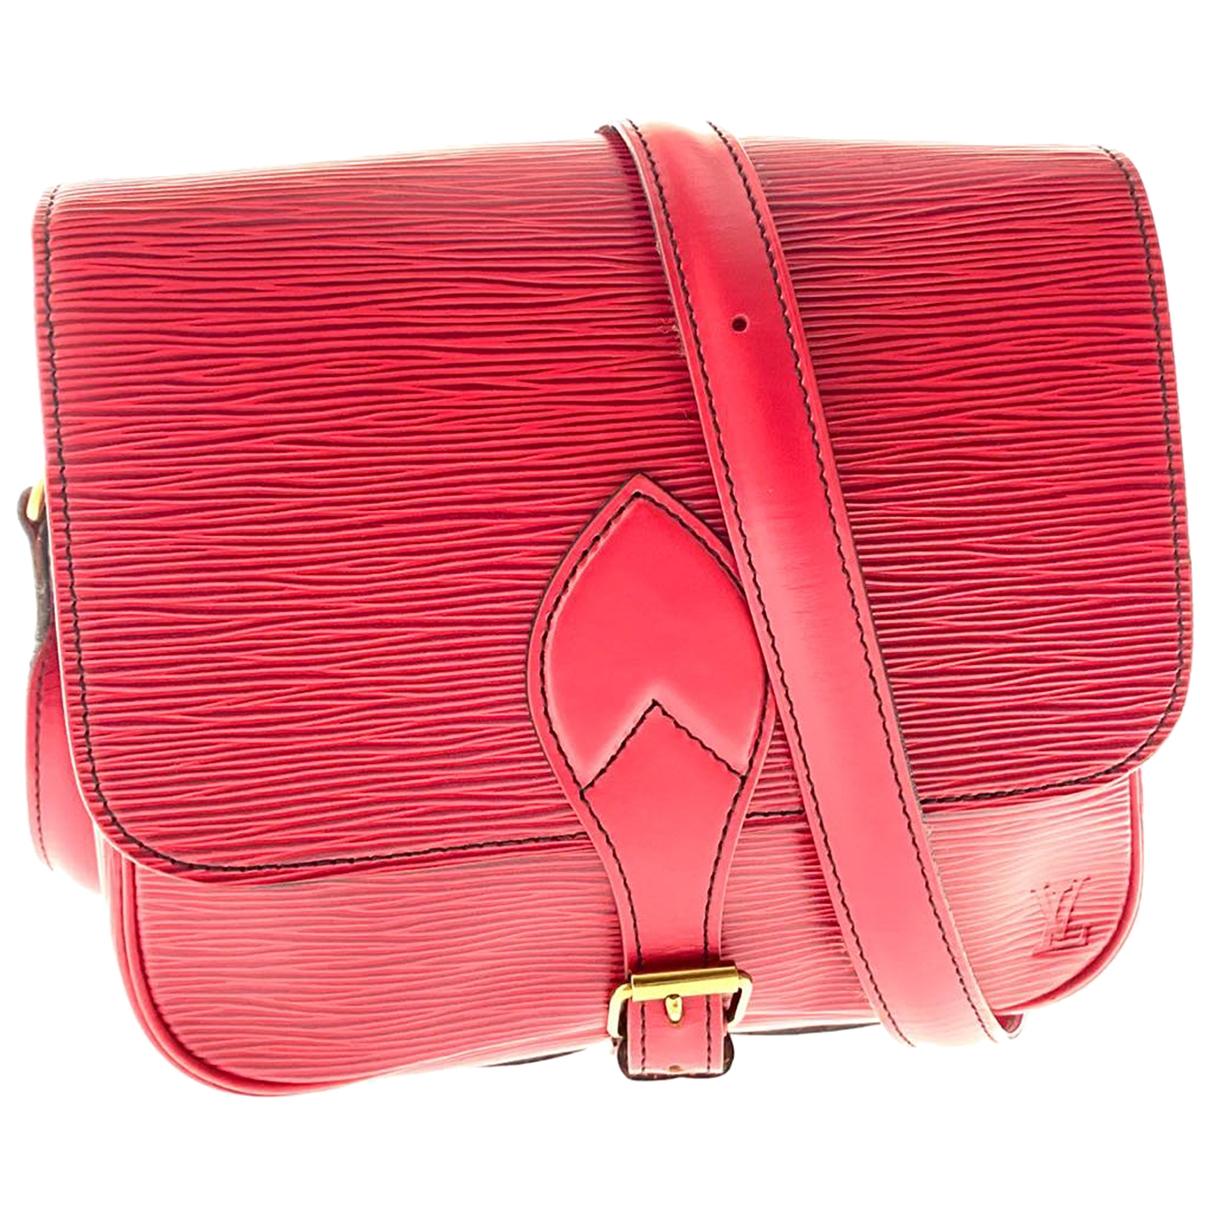 Louis Vuitton Cartouchiere Handtasche in  Rot Leder